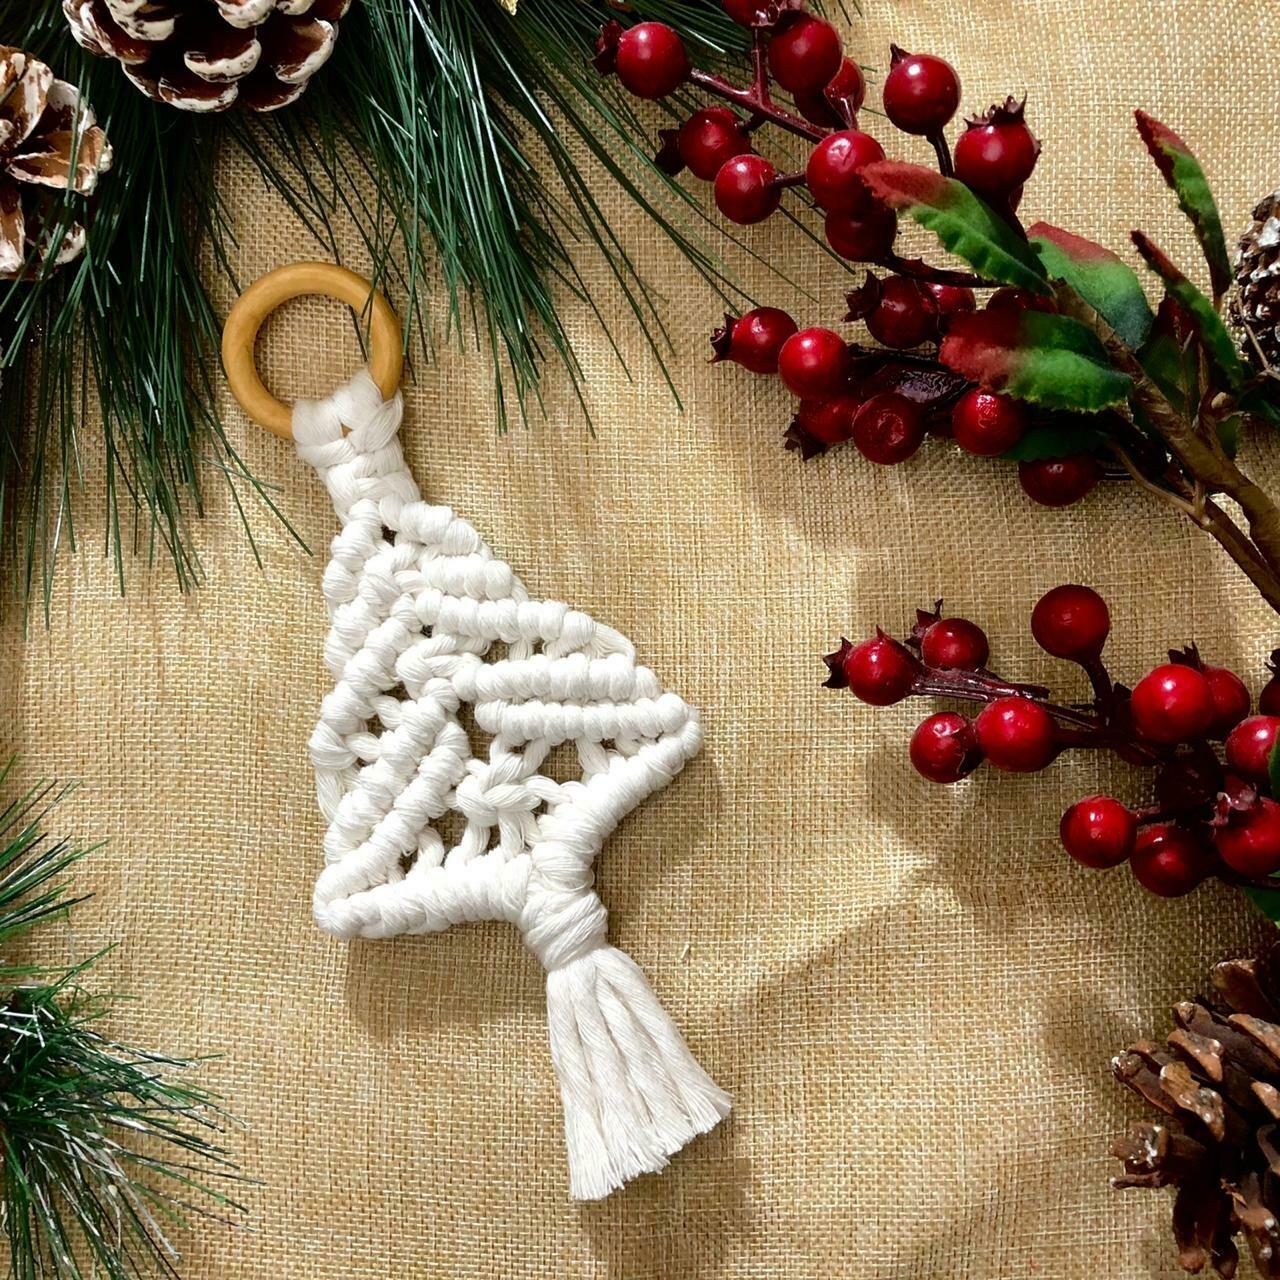 Macramé - Ornament Tree #1 (Piece) - Spot the Knot